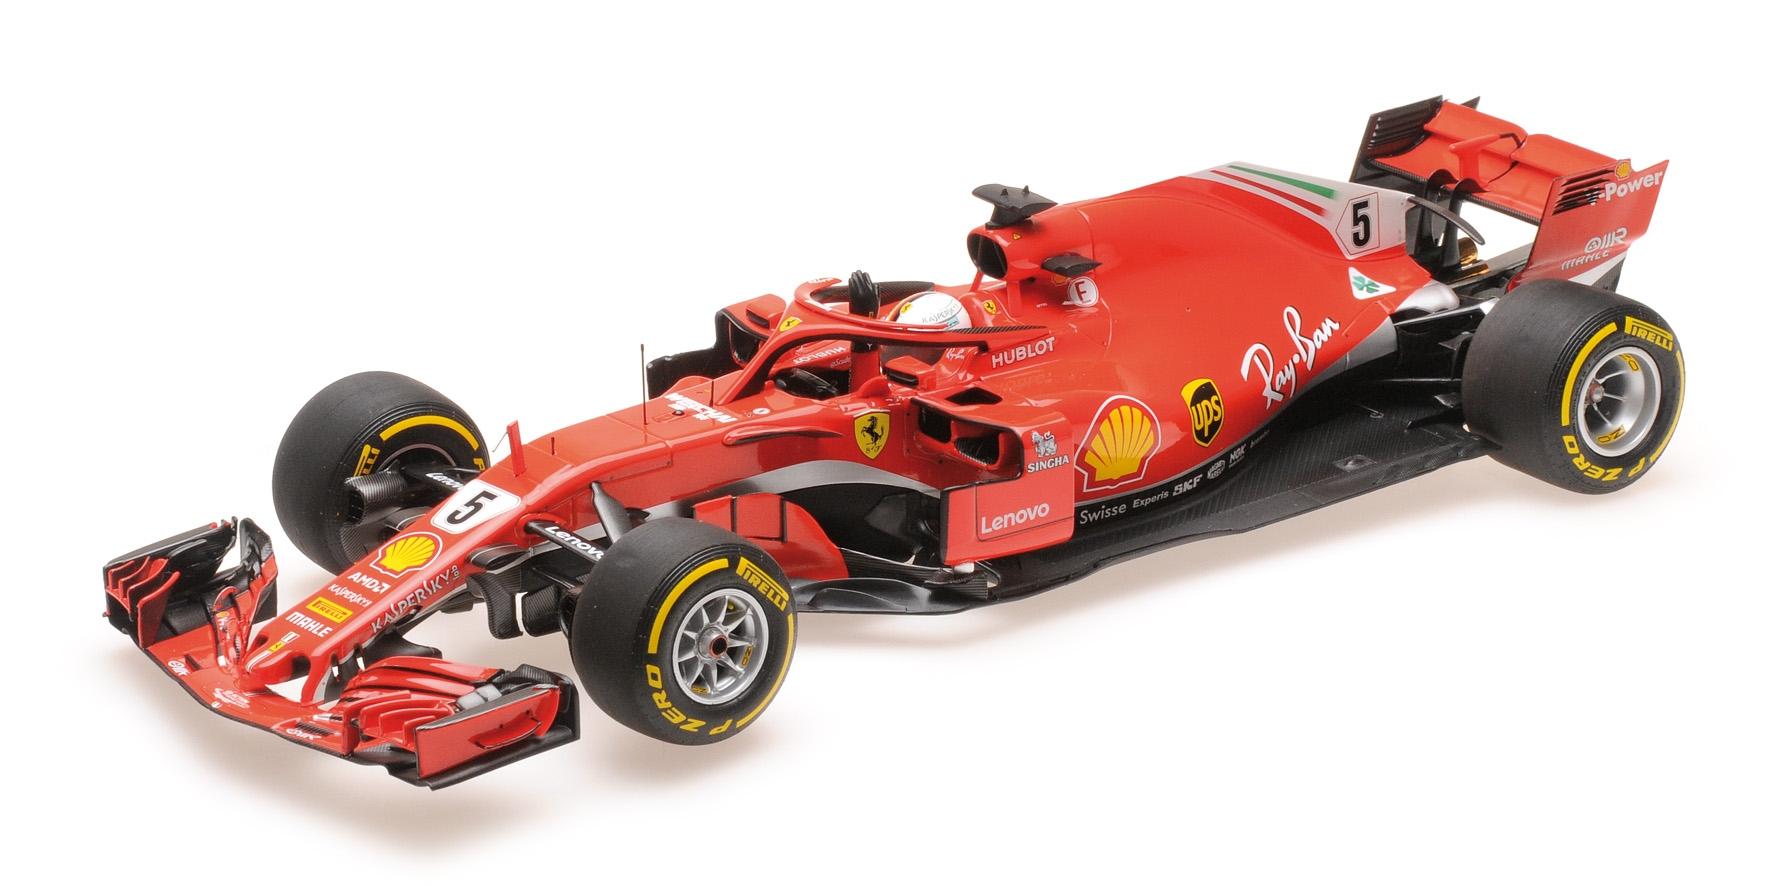 Ferrari Sf71-h Scuderia Sebastian Vettel Vainqueur Gp Australie 2018